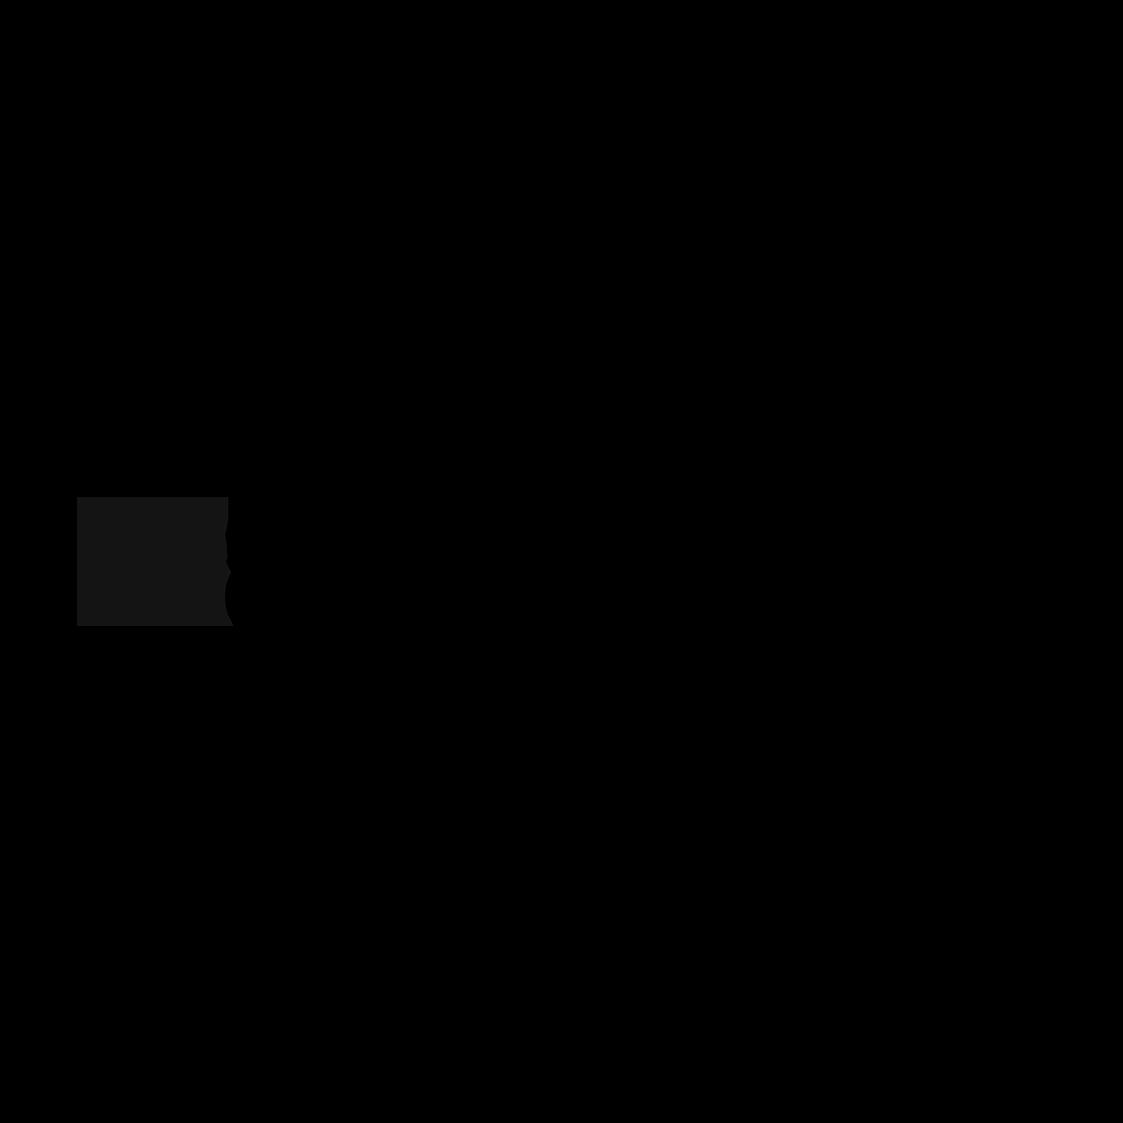 ansarada-black.png